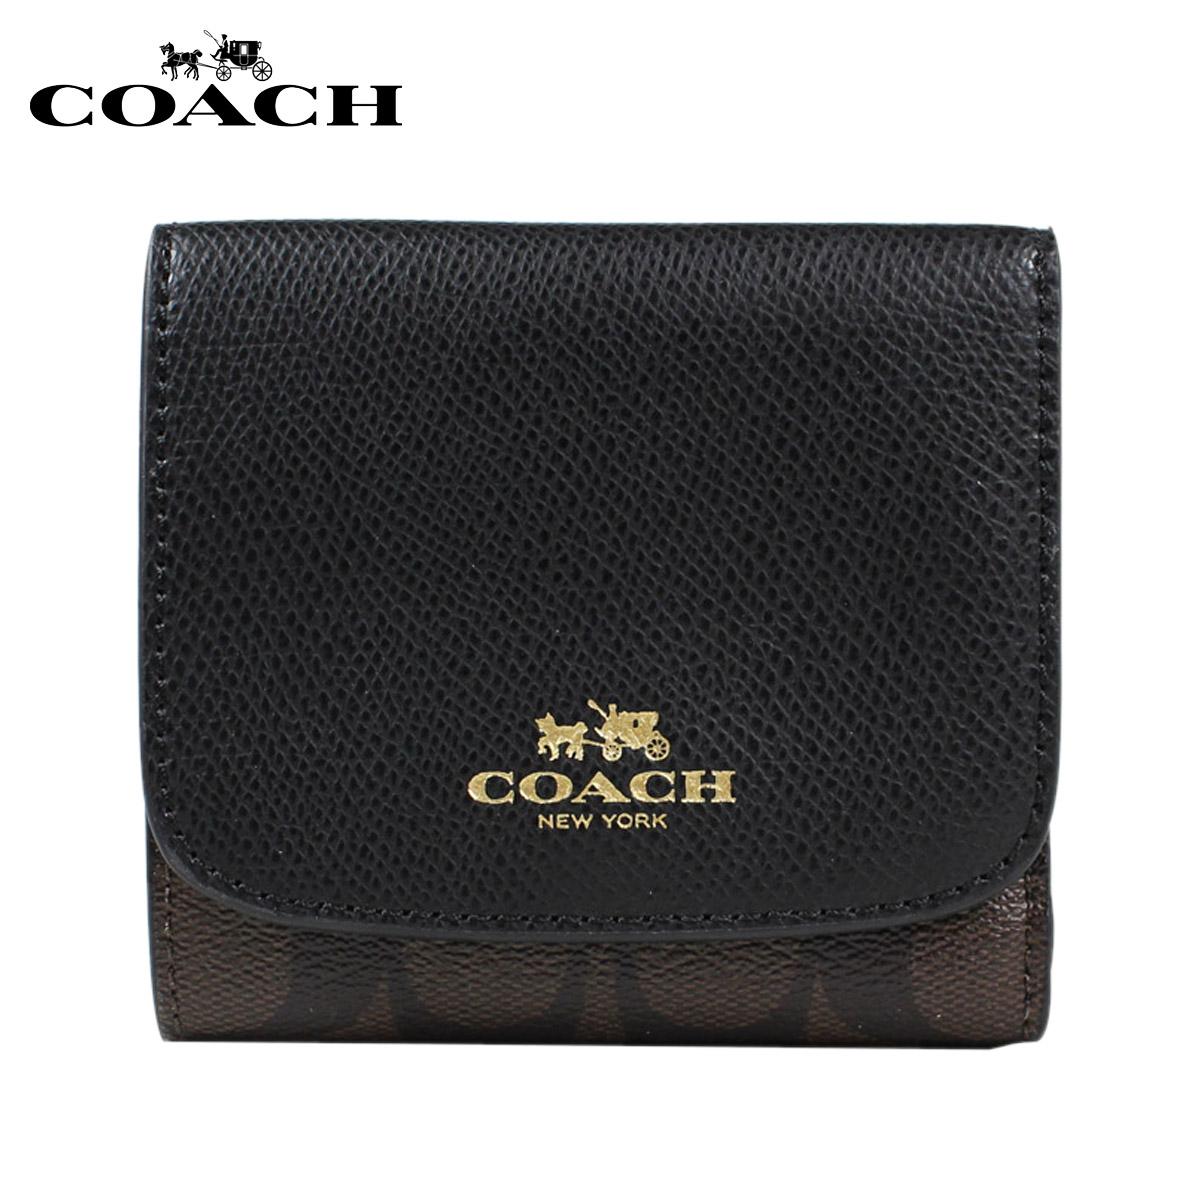 COACH教练钱包三个机会钱包F53837棕色×黑色女士